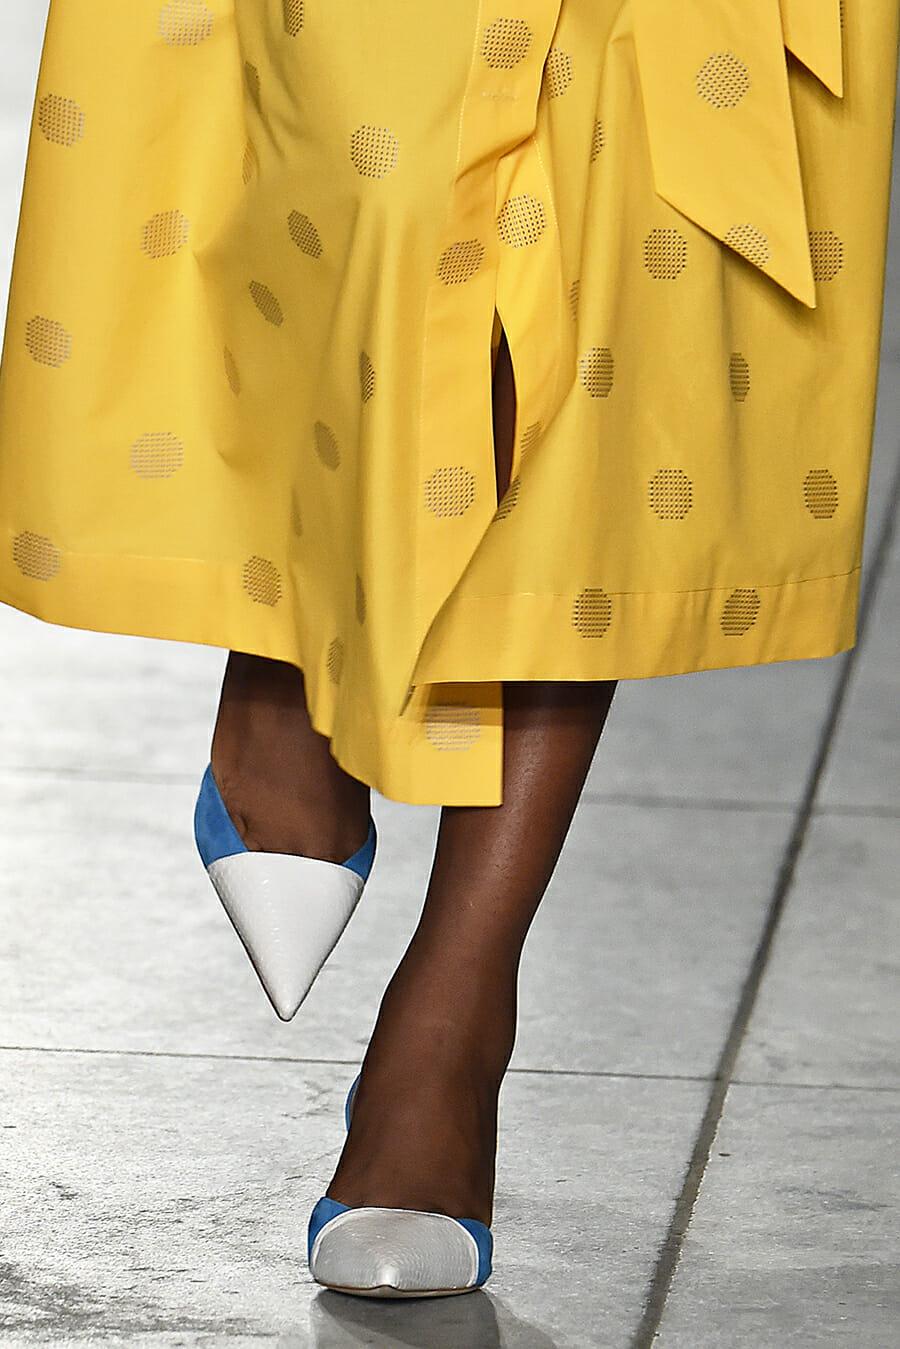 Carolina-Herrera-New-York-Fashion-Week-Spring-Summer-2018-NY-September-2017-look6-detail3